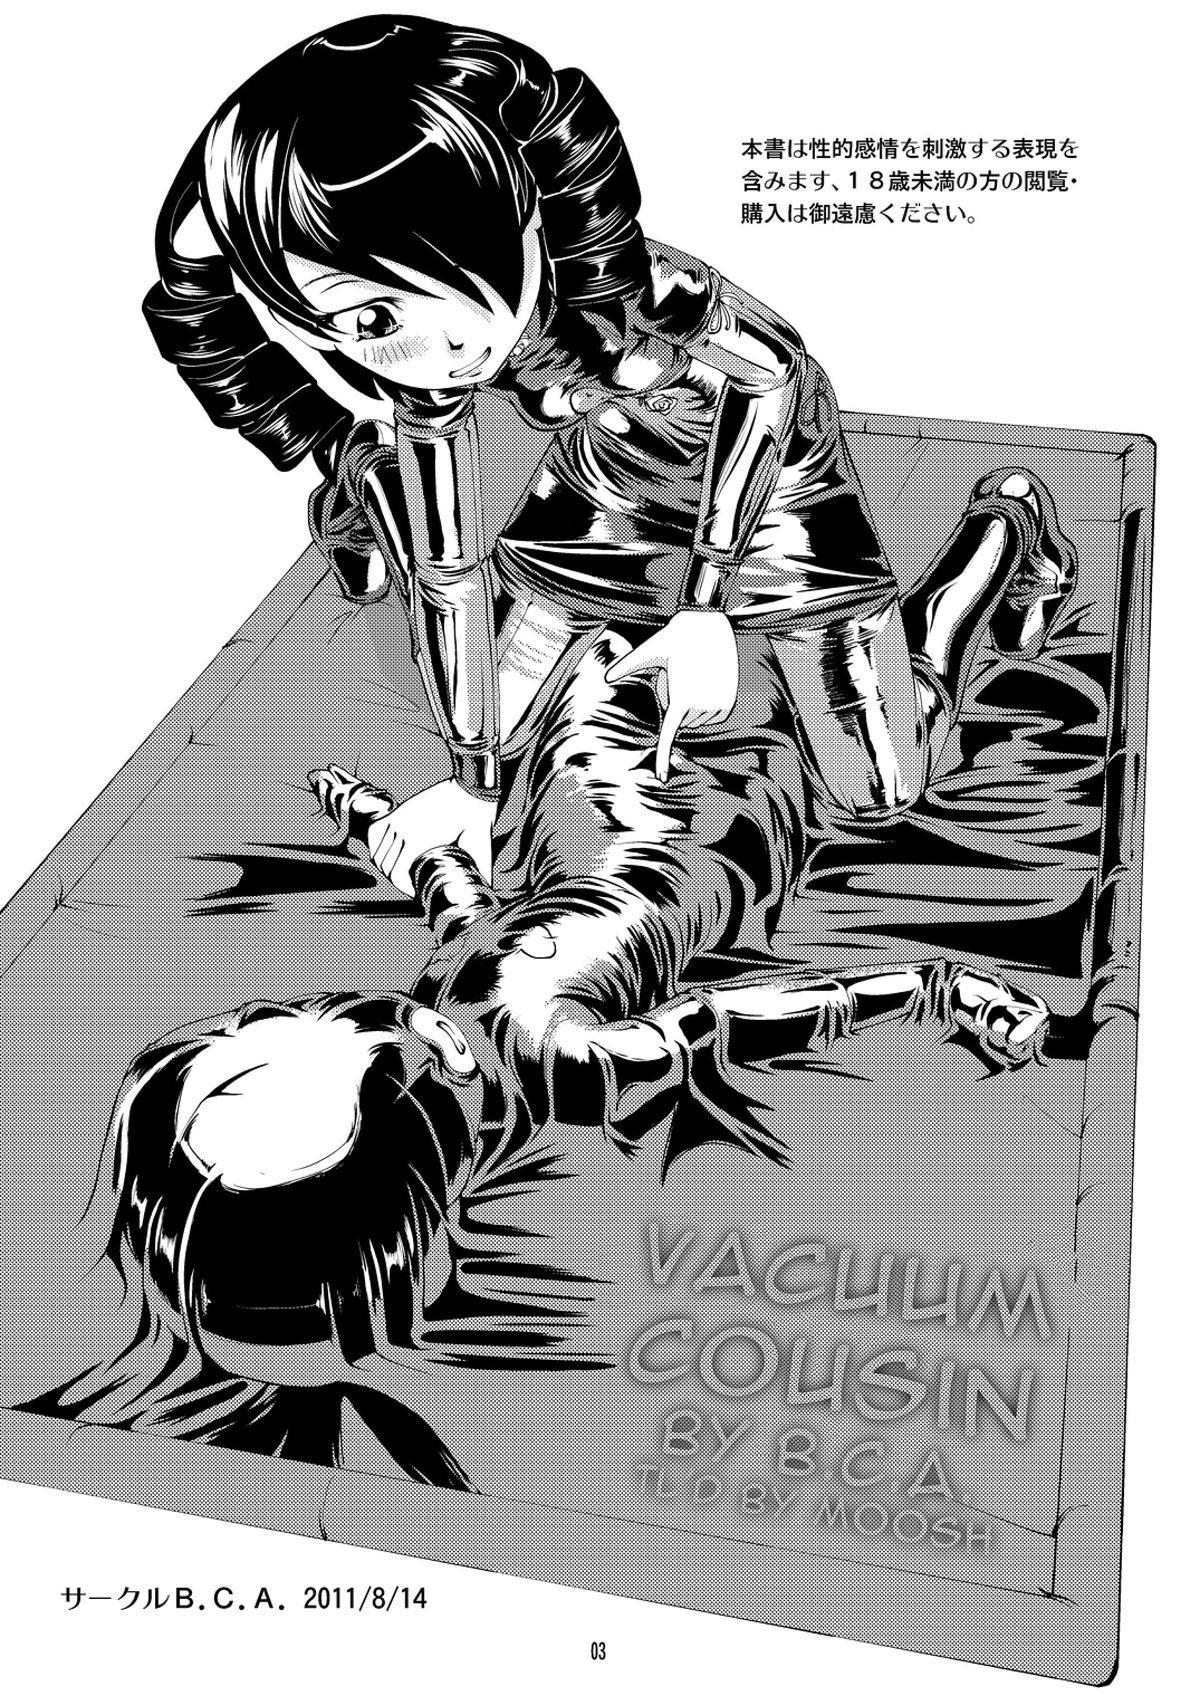 Vacuum Oneesan   Vacuum Cousin 2